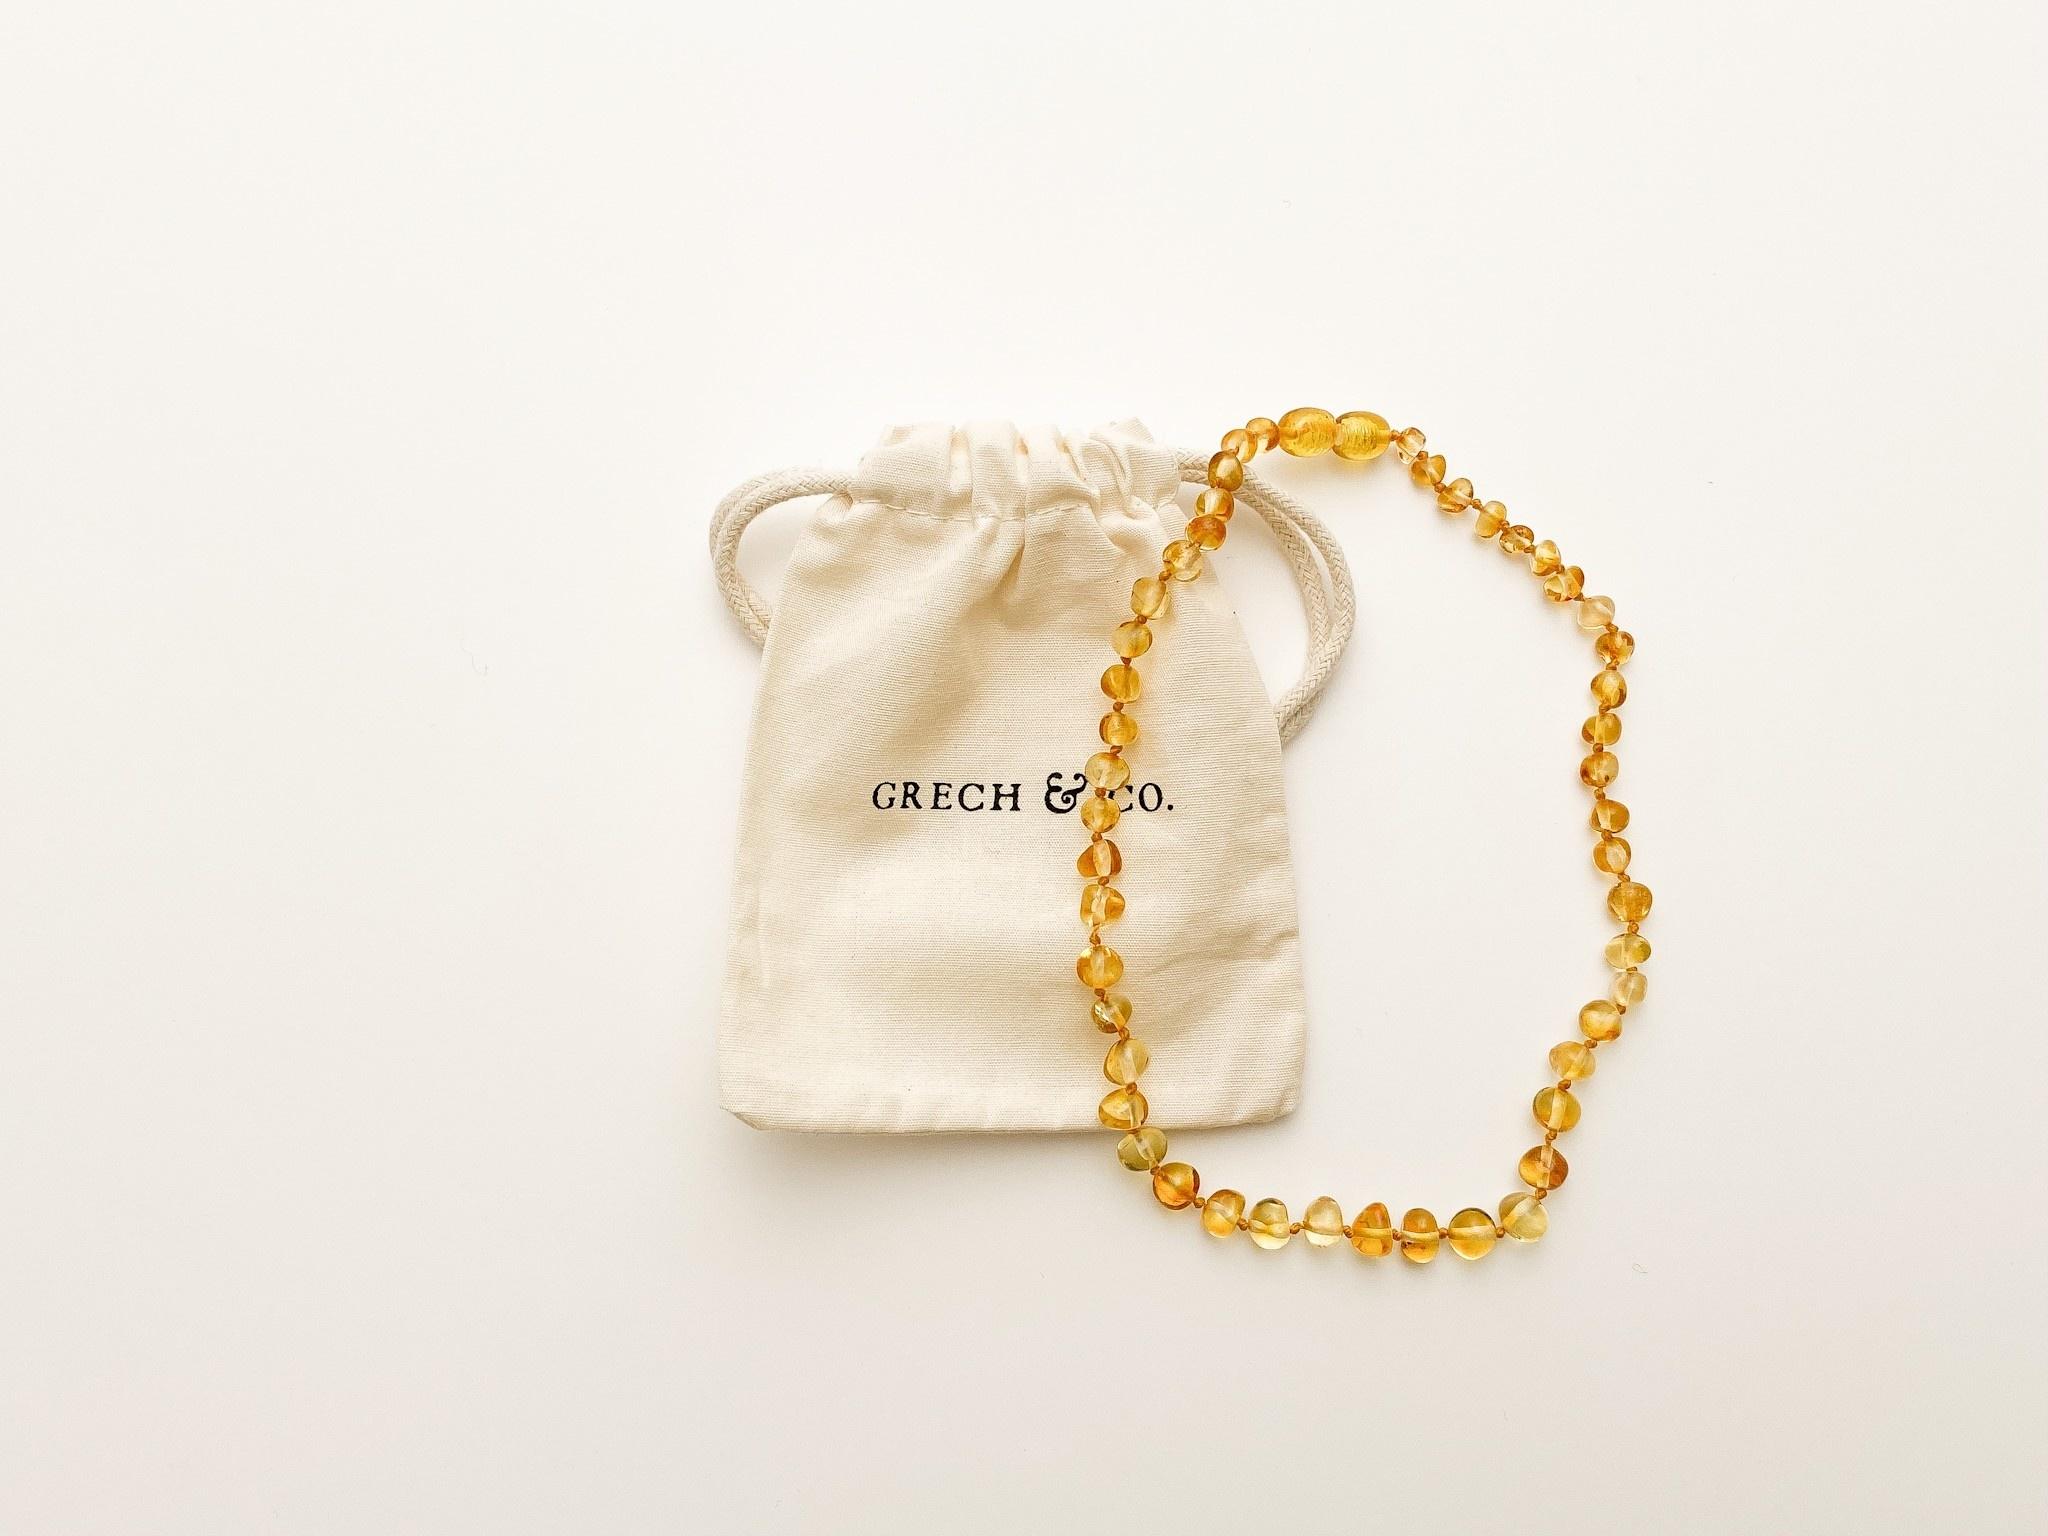 Grech & Co Amber kinder ketting | enlighten